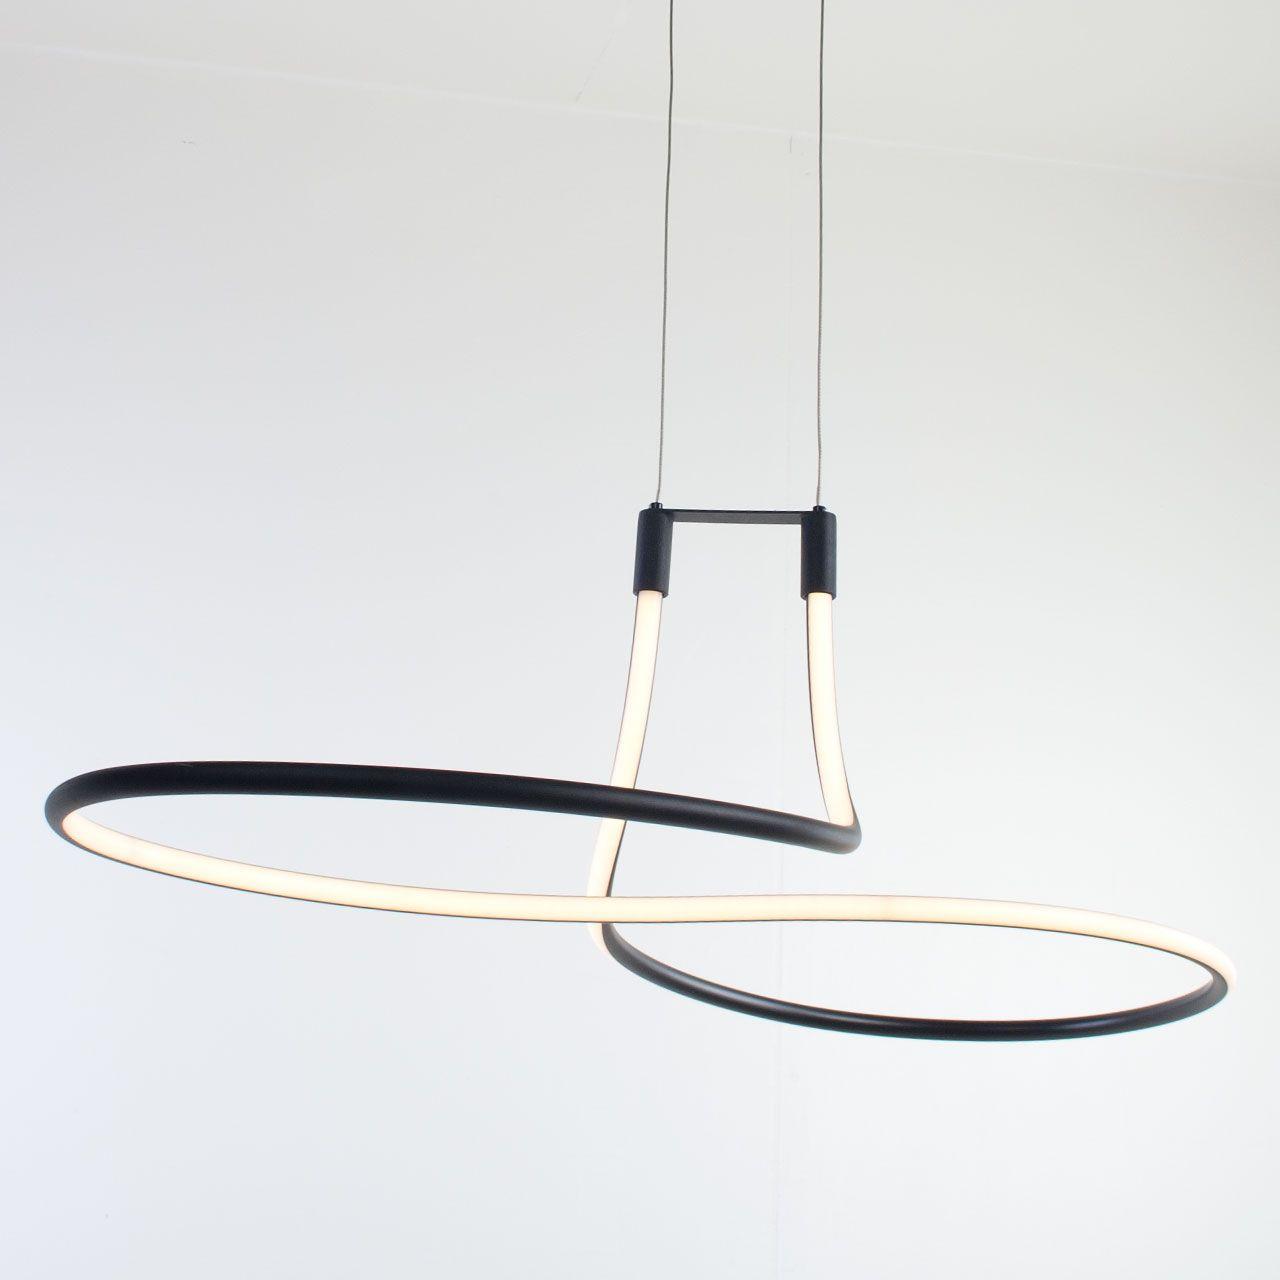 Nieuw Zwarte eettafellamp led Basel - LampenConcurrent.nl XC-77